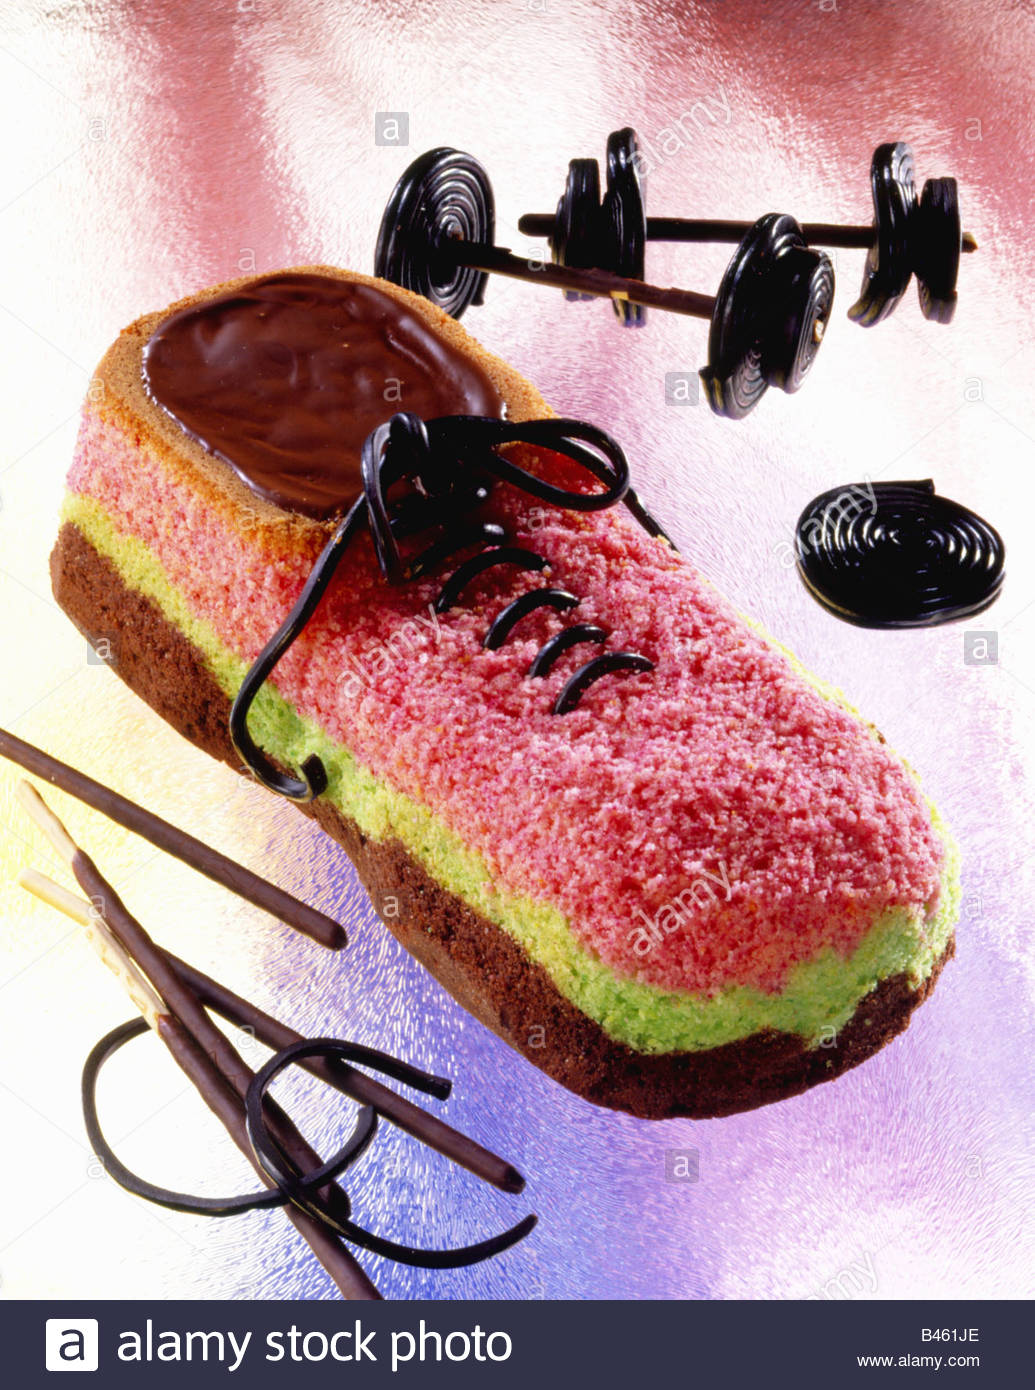 amp; Photos Alamy Images Shoe Cake EqwpCqB